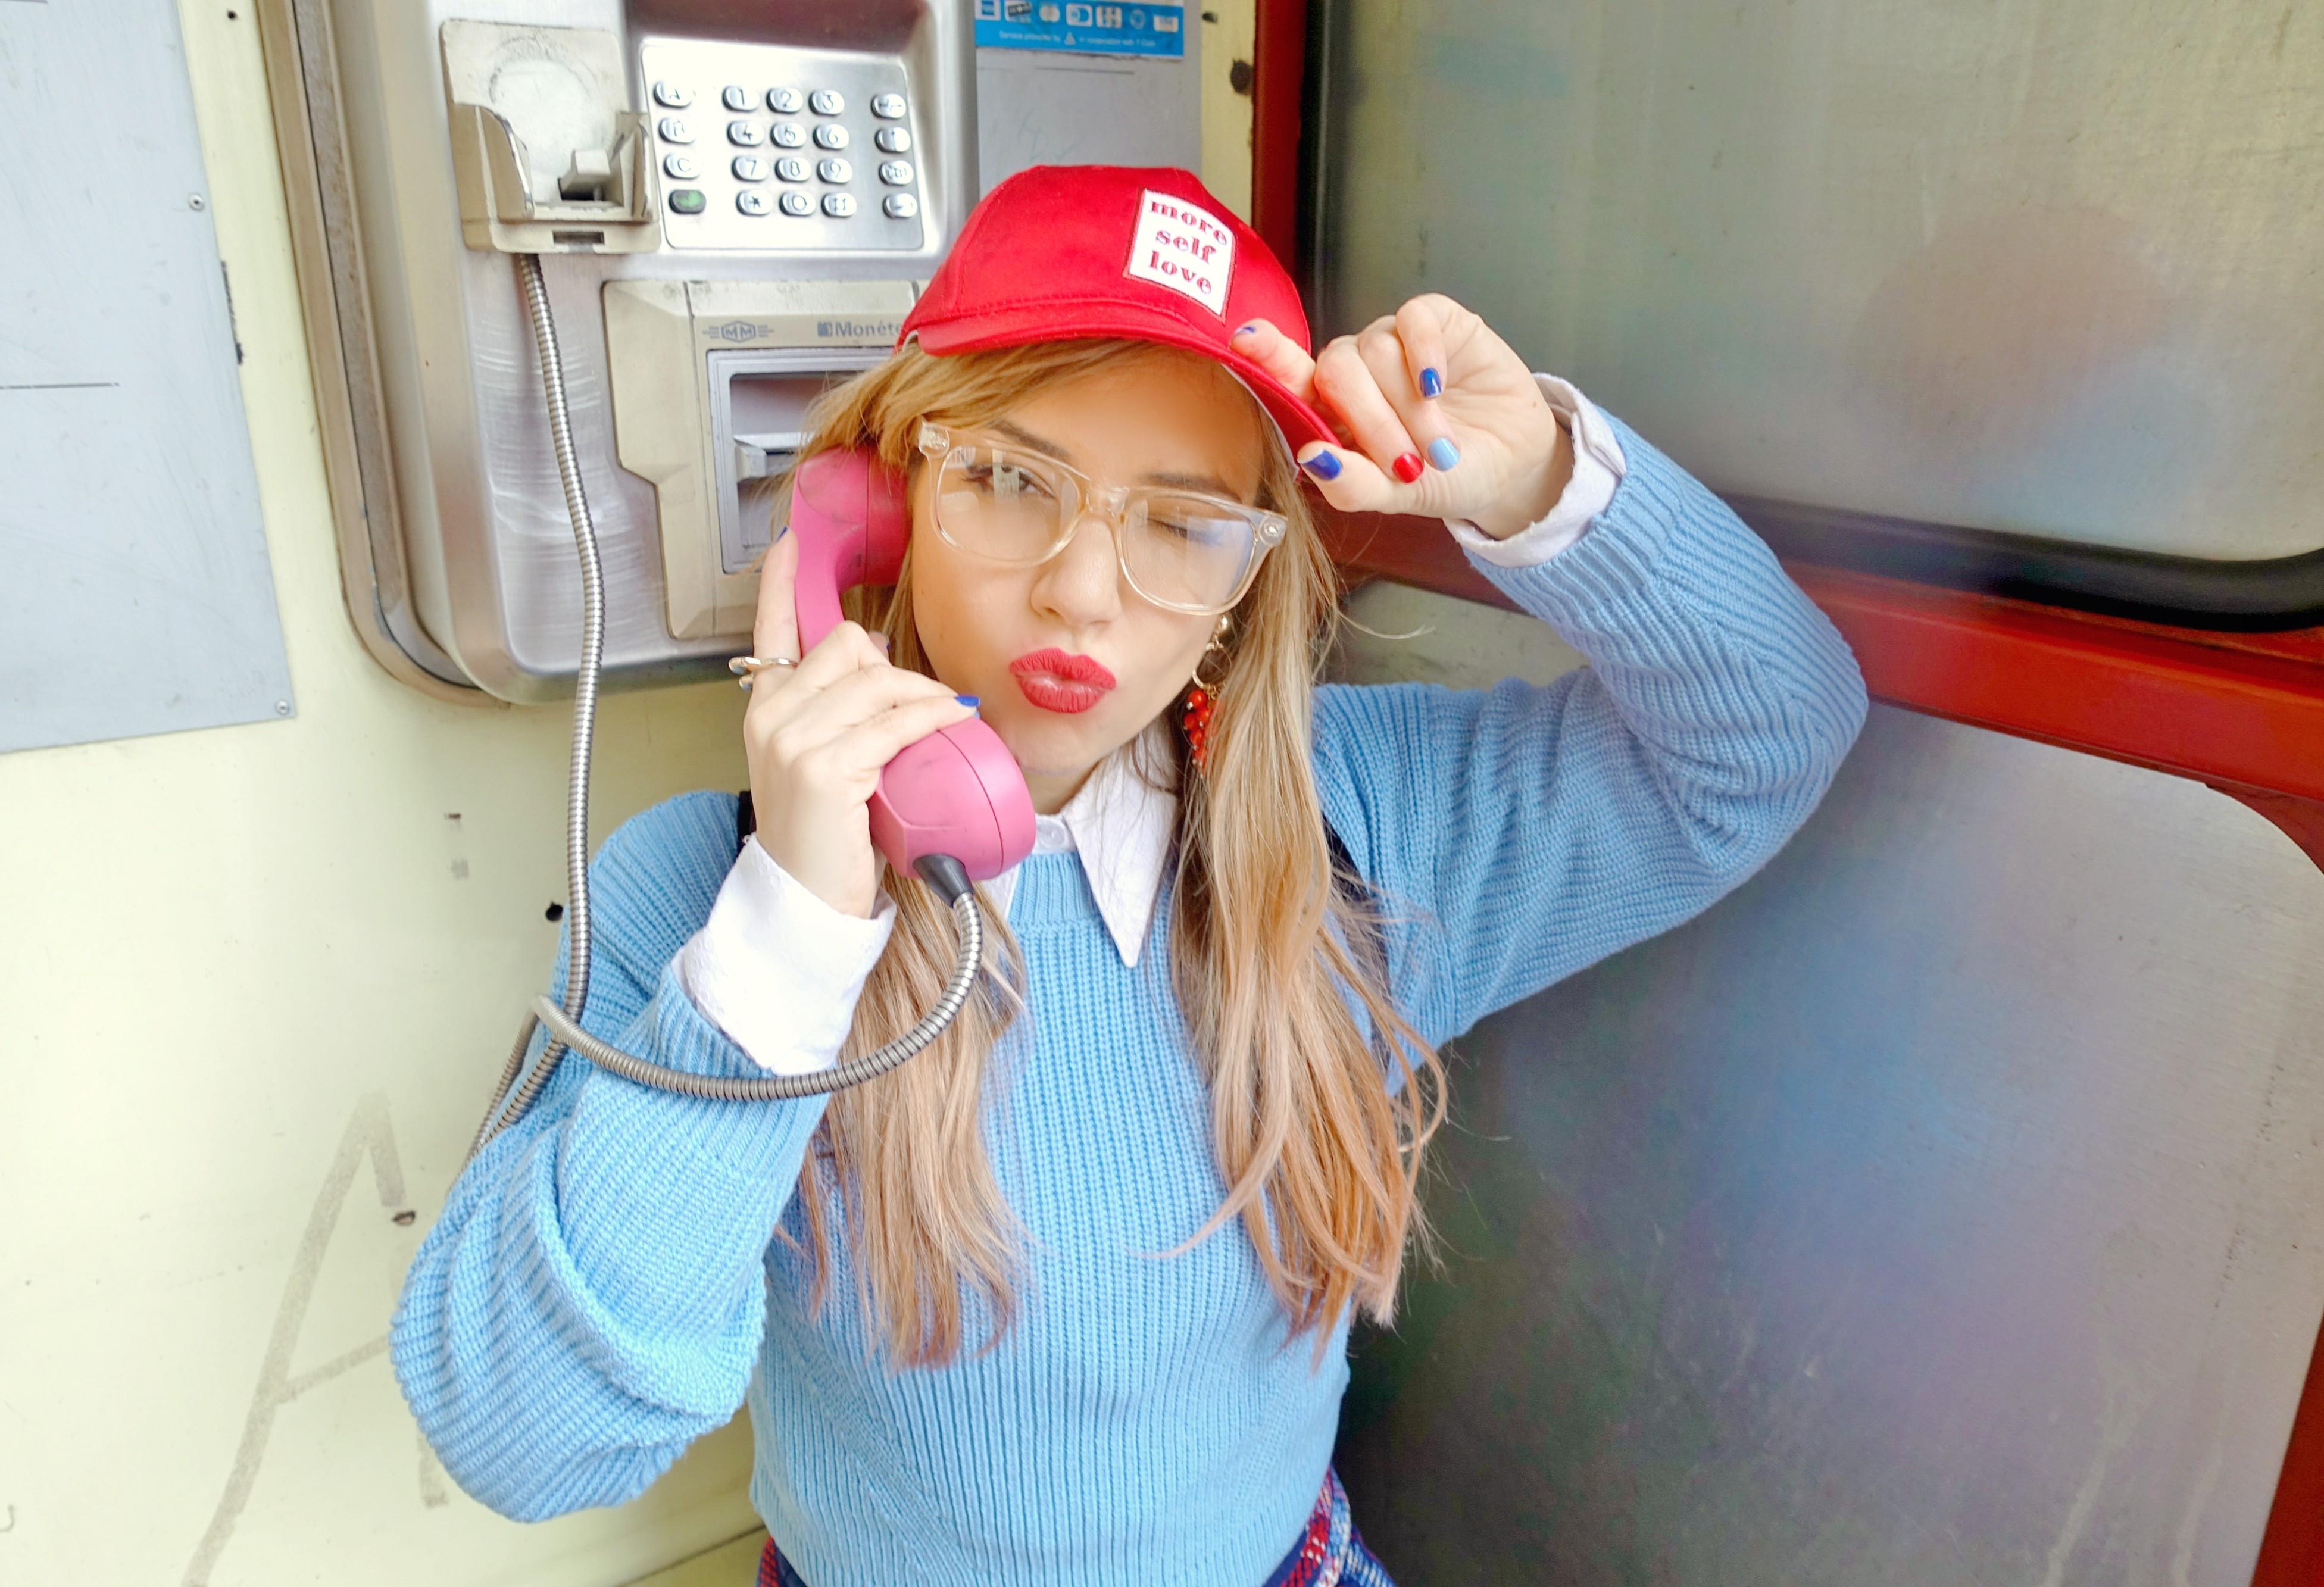 PiensaenChic-influencer-blog-de-moda-ChicAdicta-gorra-beisbolera-Chic-Adicta-look-jersey-gafas-transparentes-Piensa-en-Chic